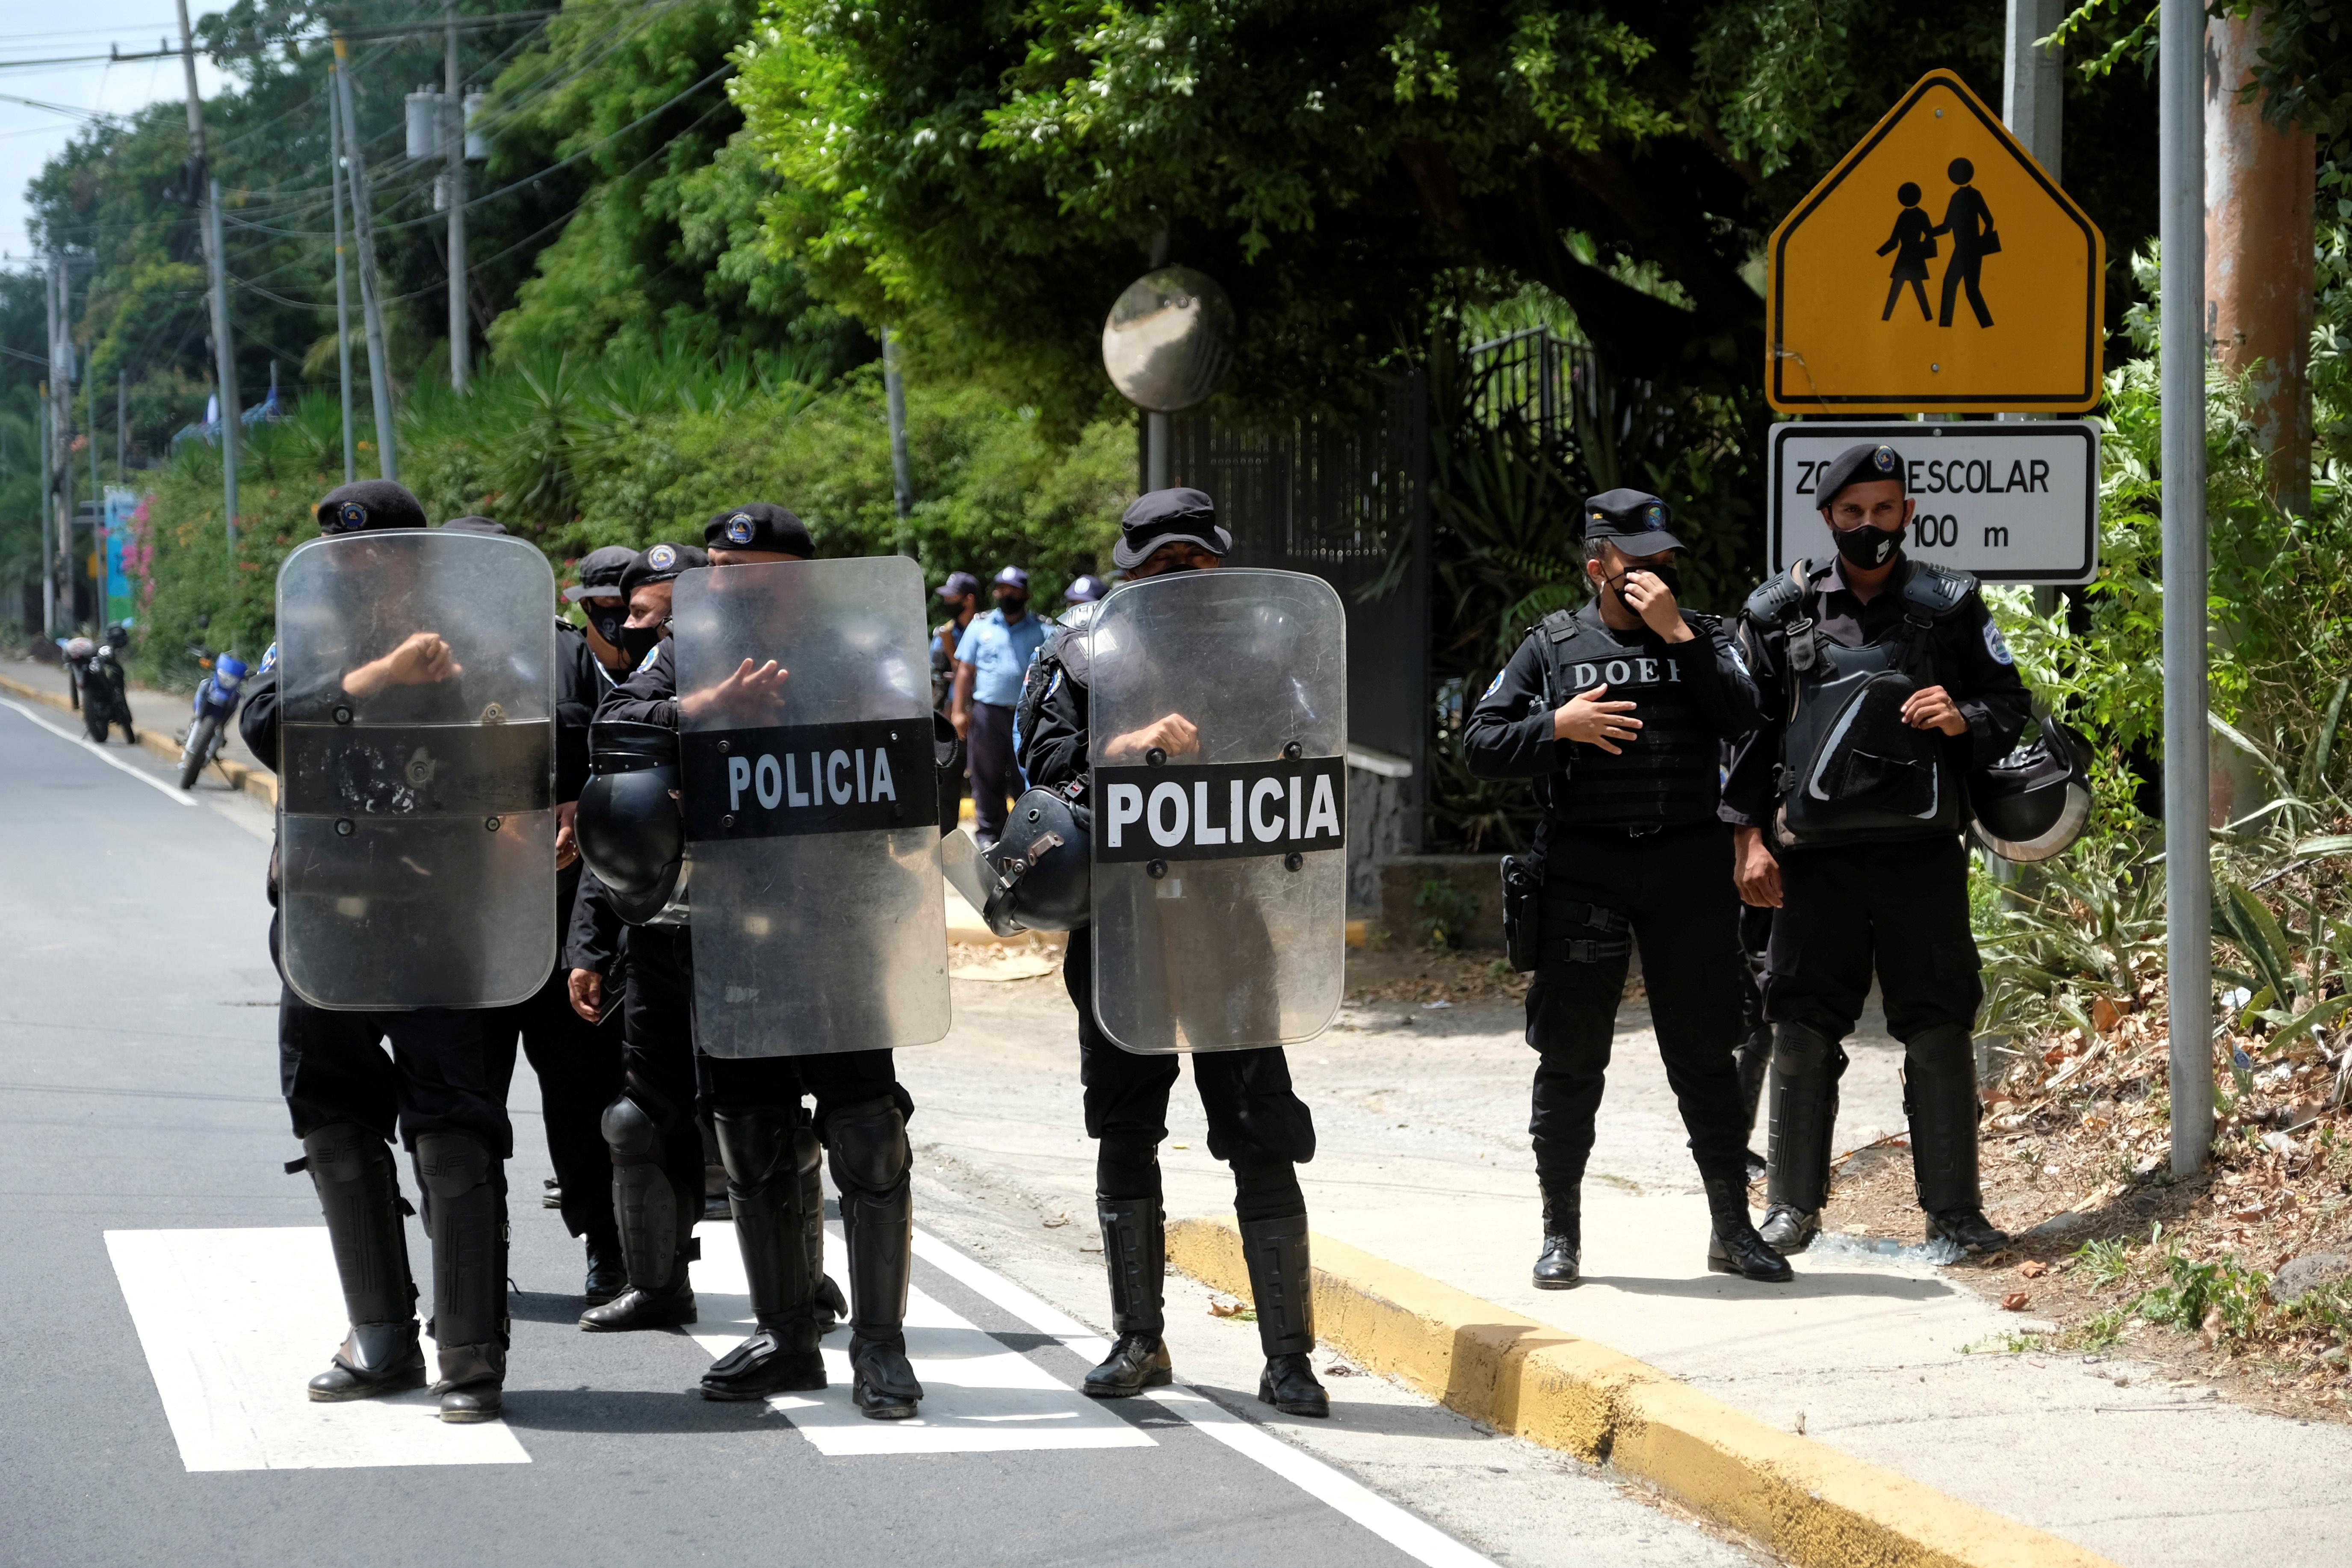 Nicaraguan police detain brother of arrested opposition leader Chamorro